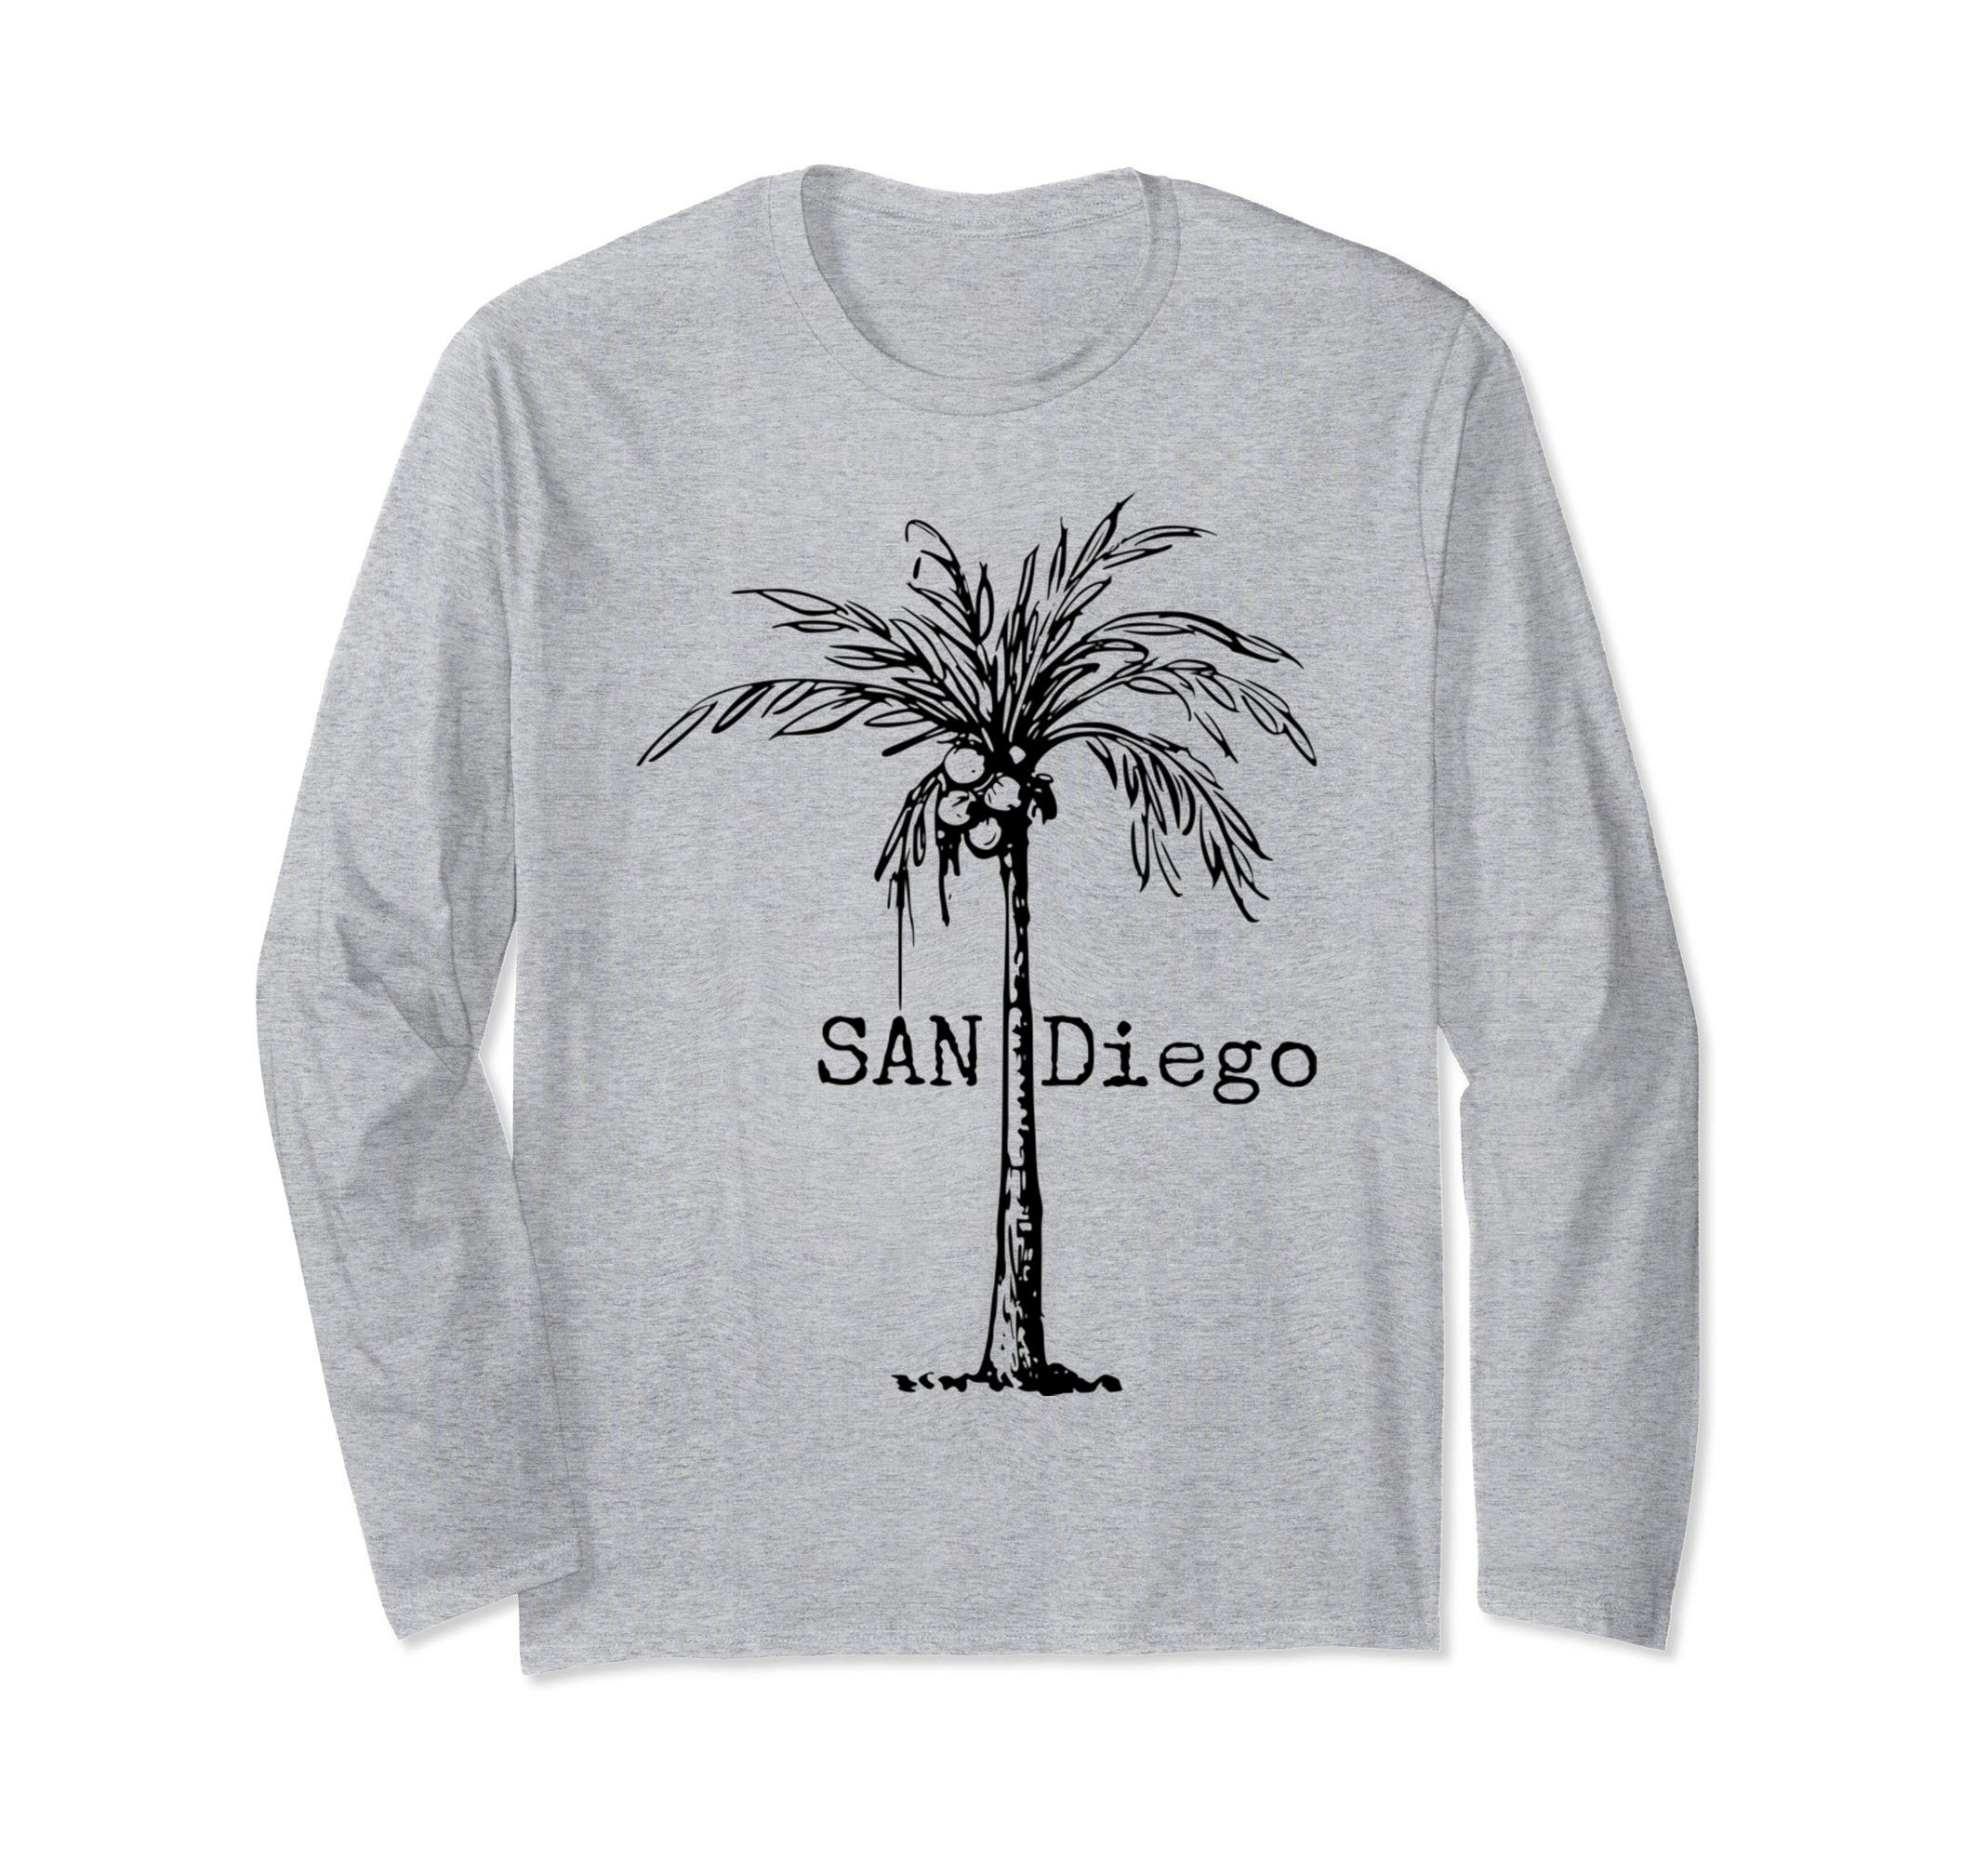 San Diego - Palm Tree San Diego  Long Sleeve T-Shirt by TEAM ALOHA DESIGN CO